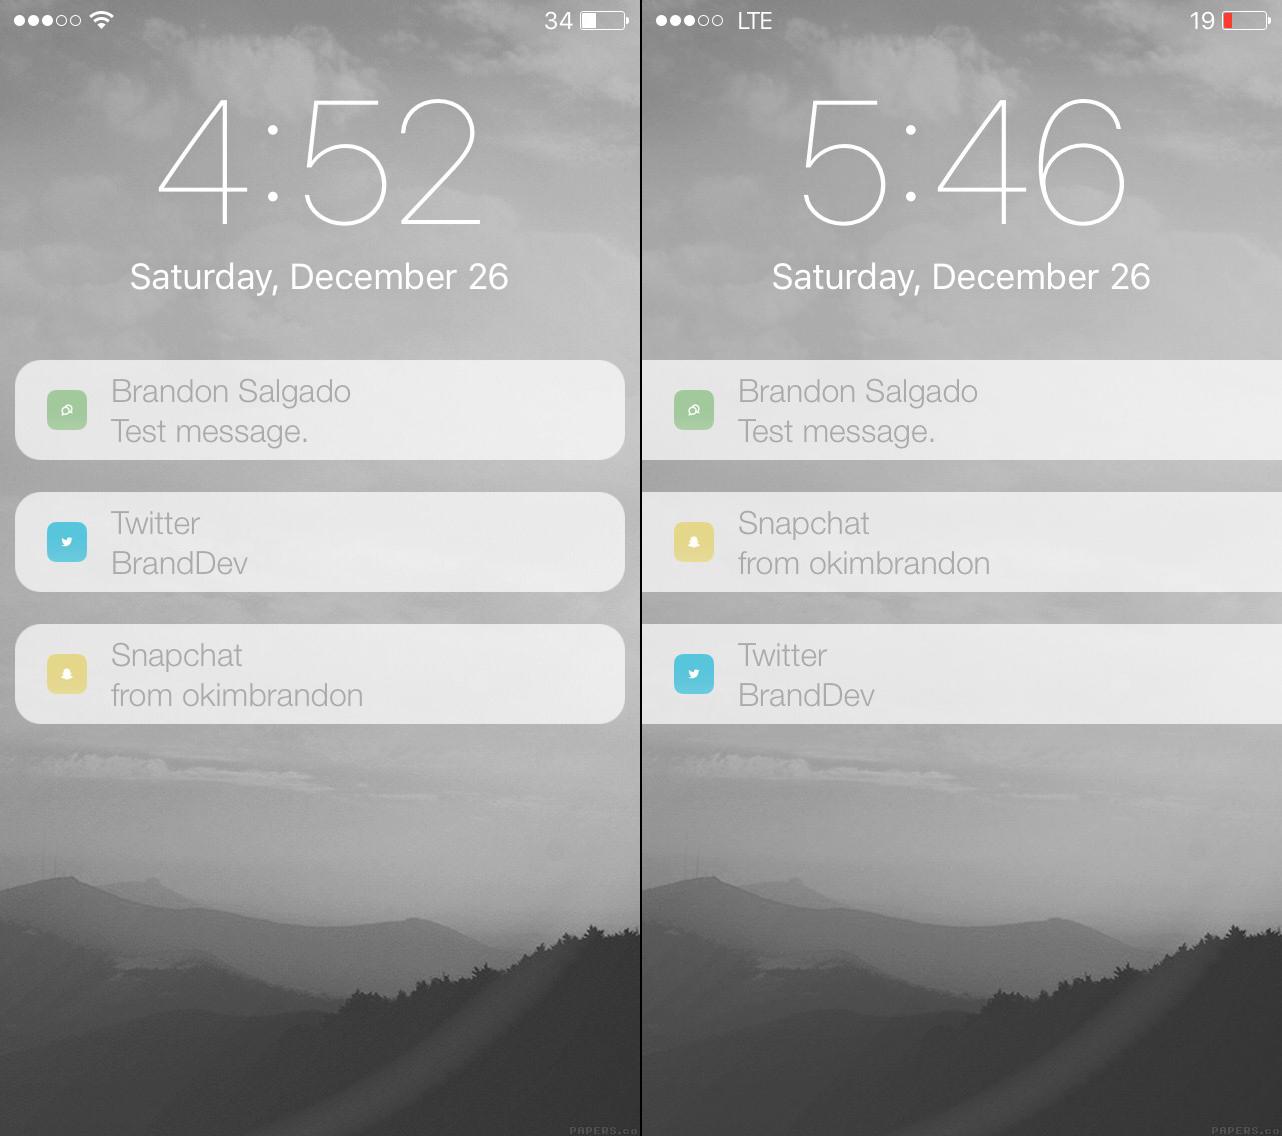 RedesignedNotifications 1 Cydia : donner un nouveau look à ses notifications iOS